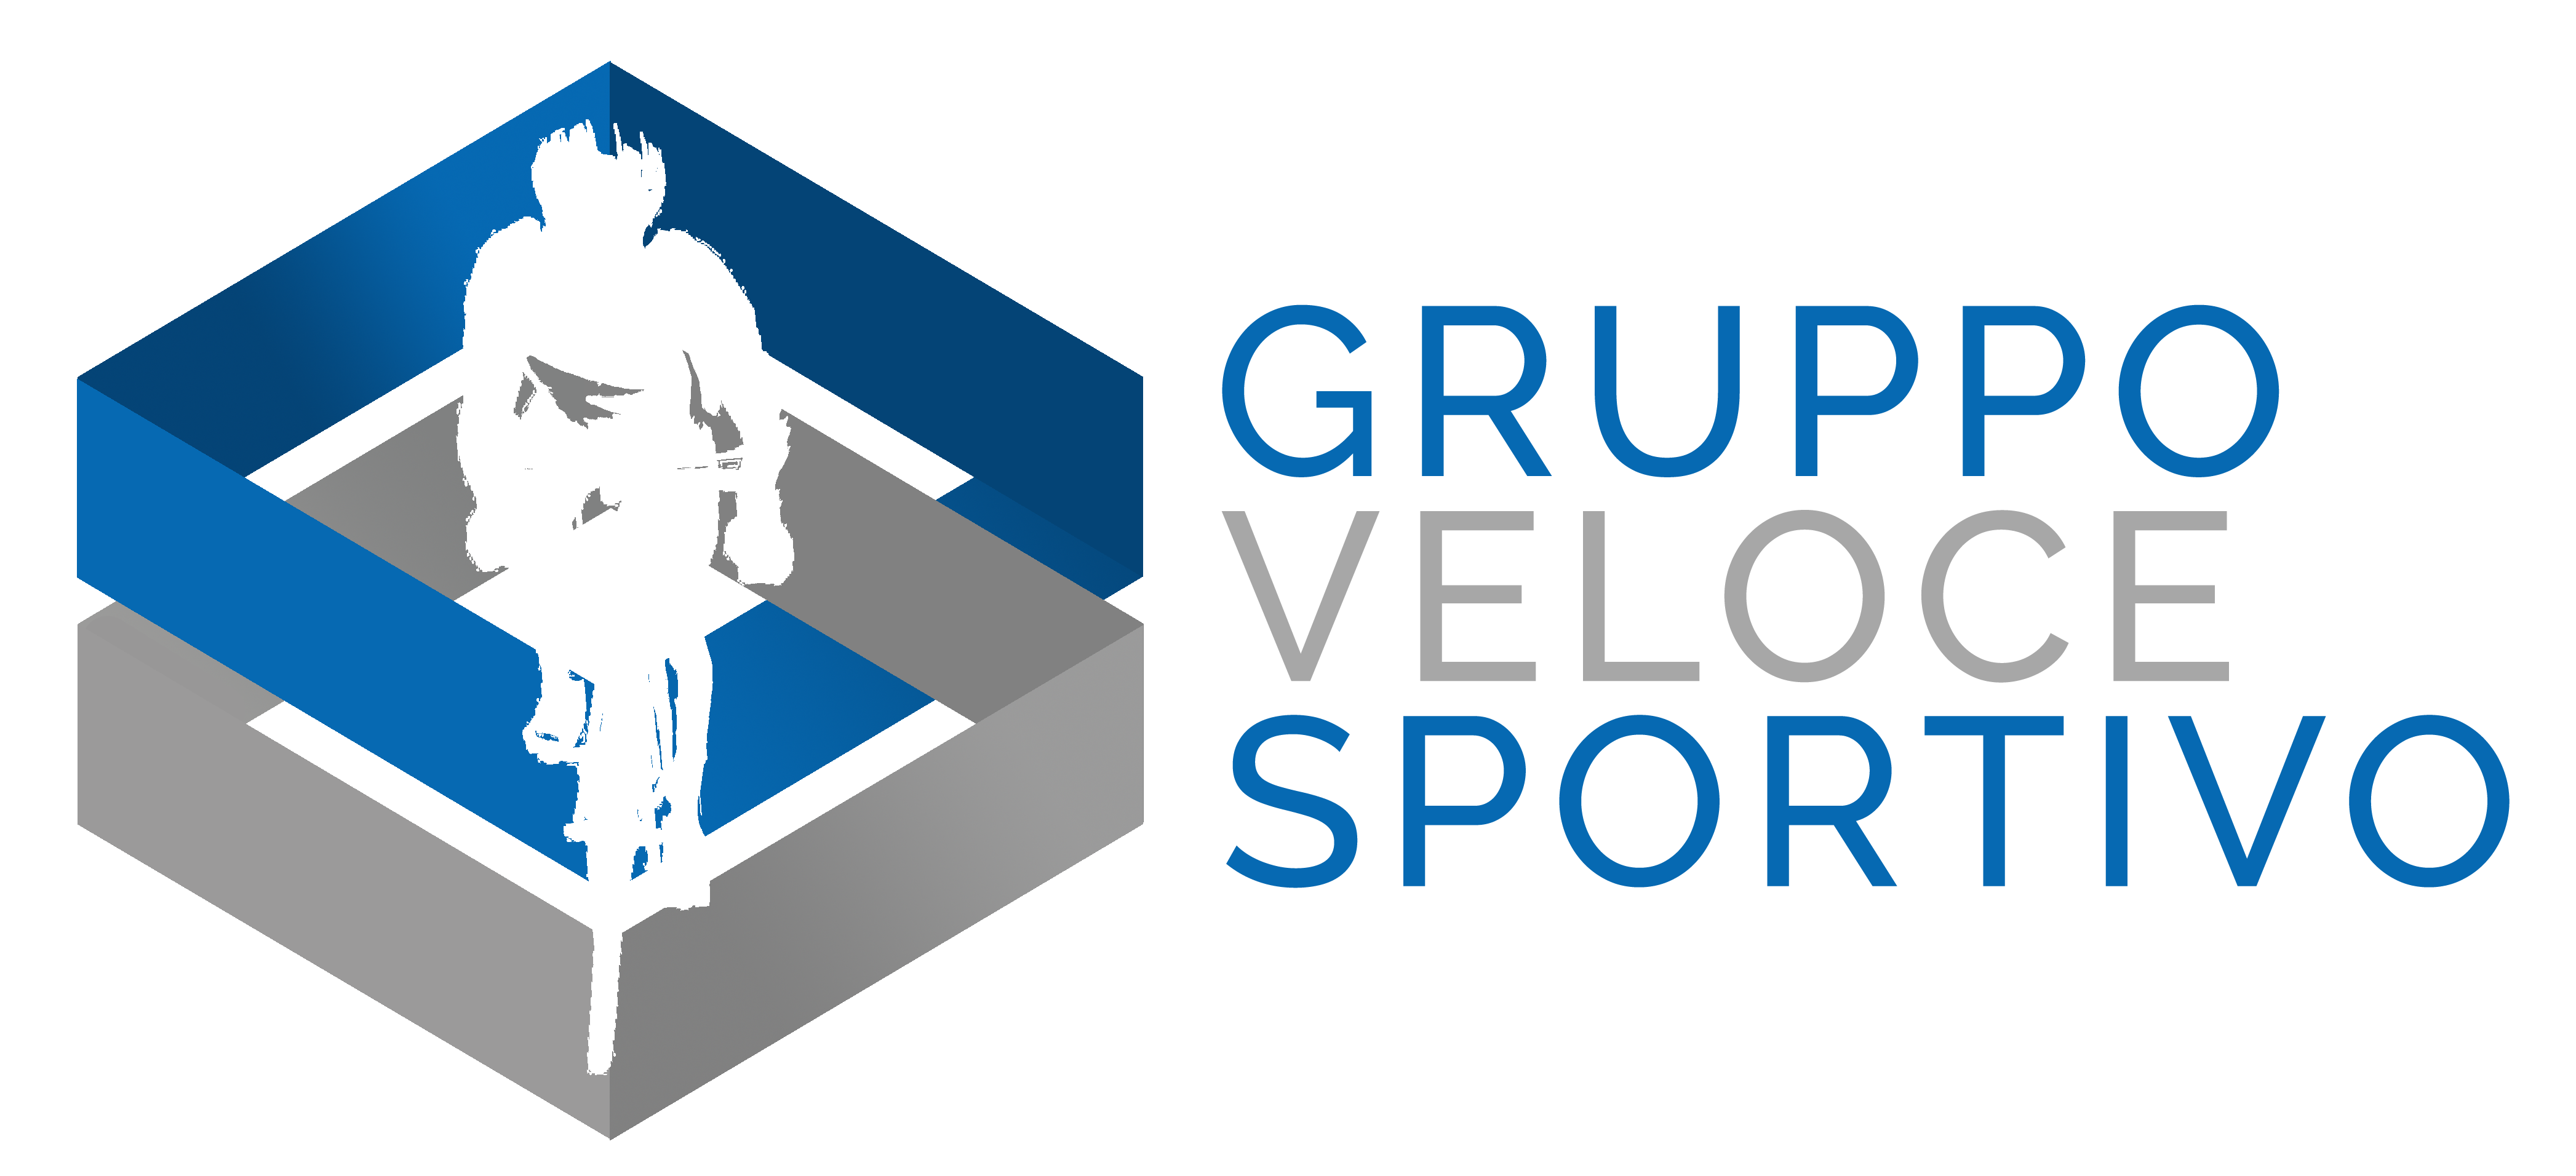 Gruppo Veloce Sportivo